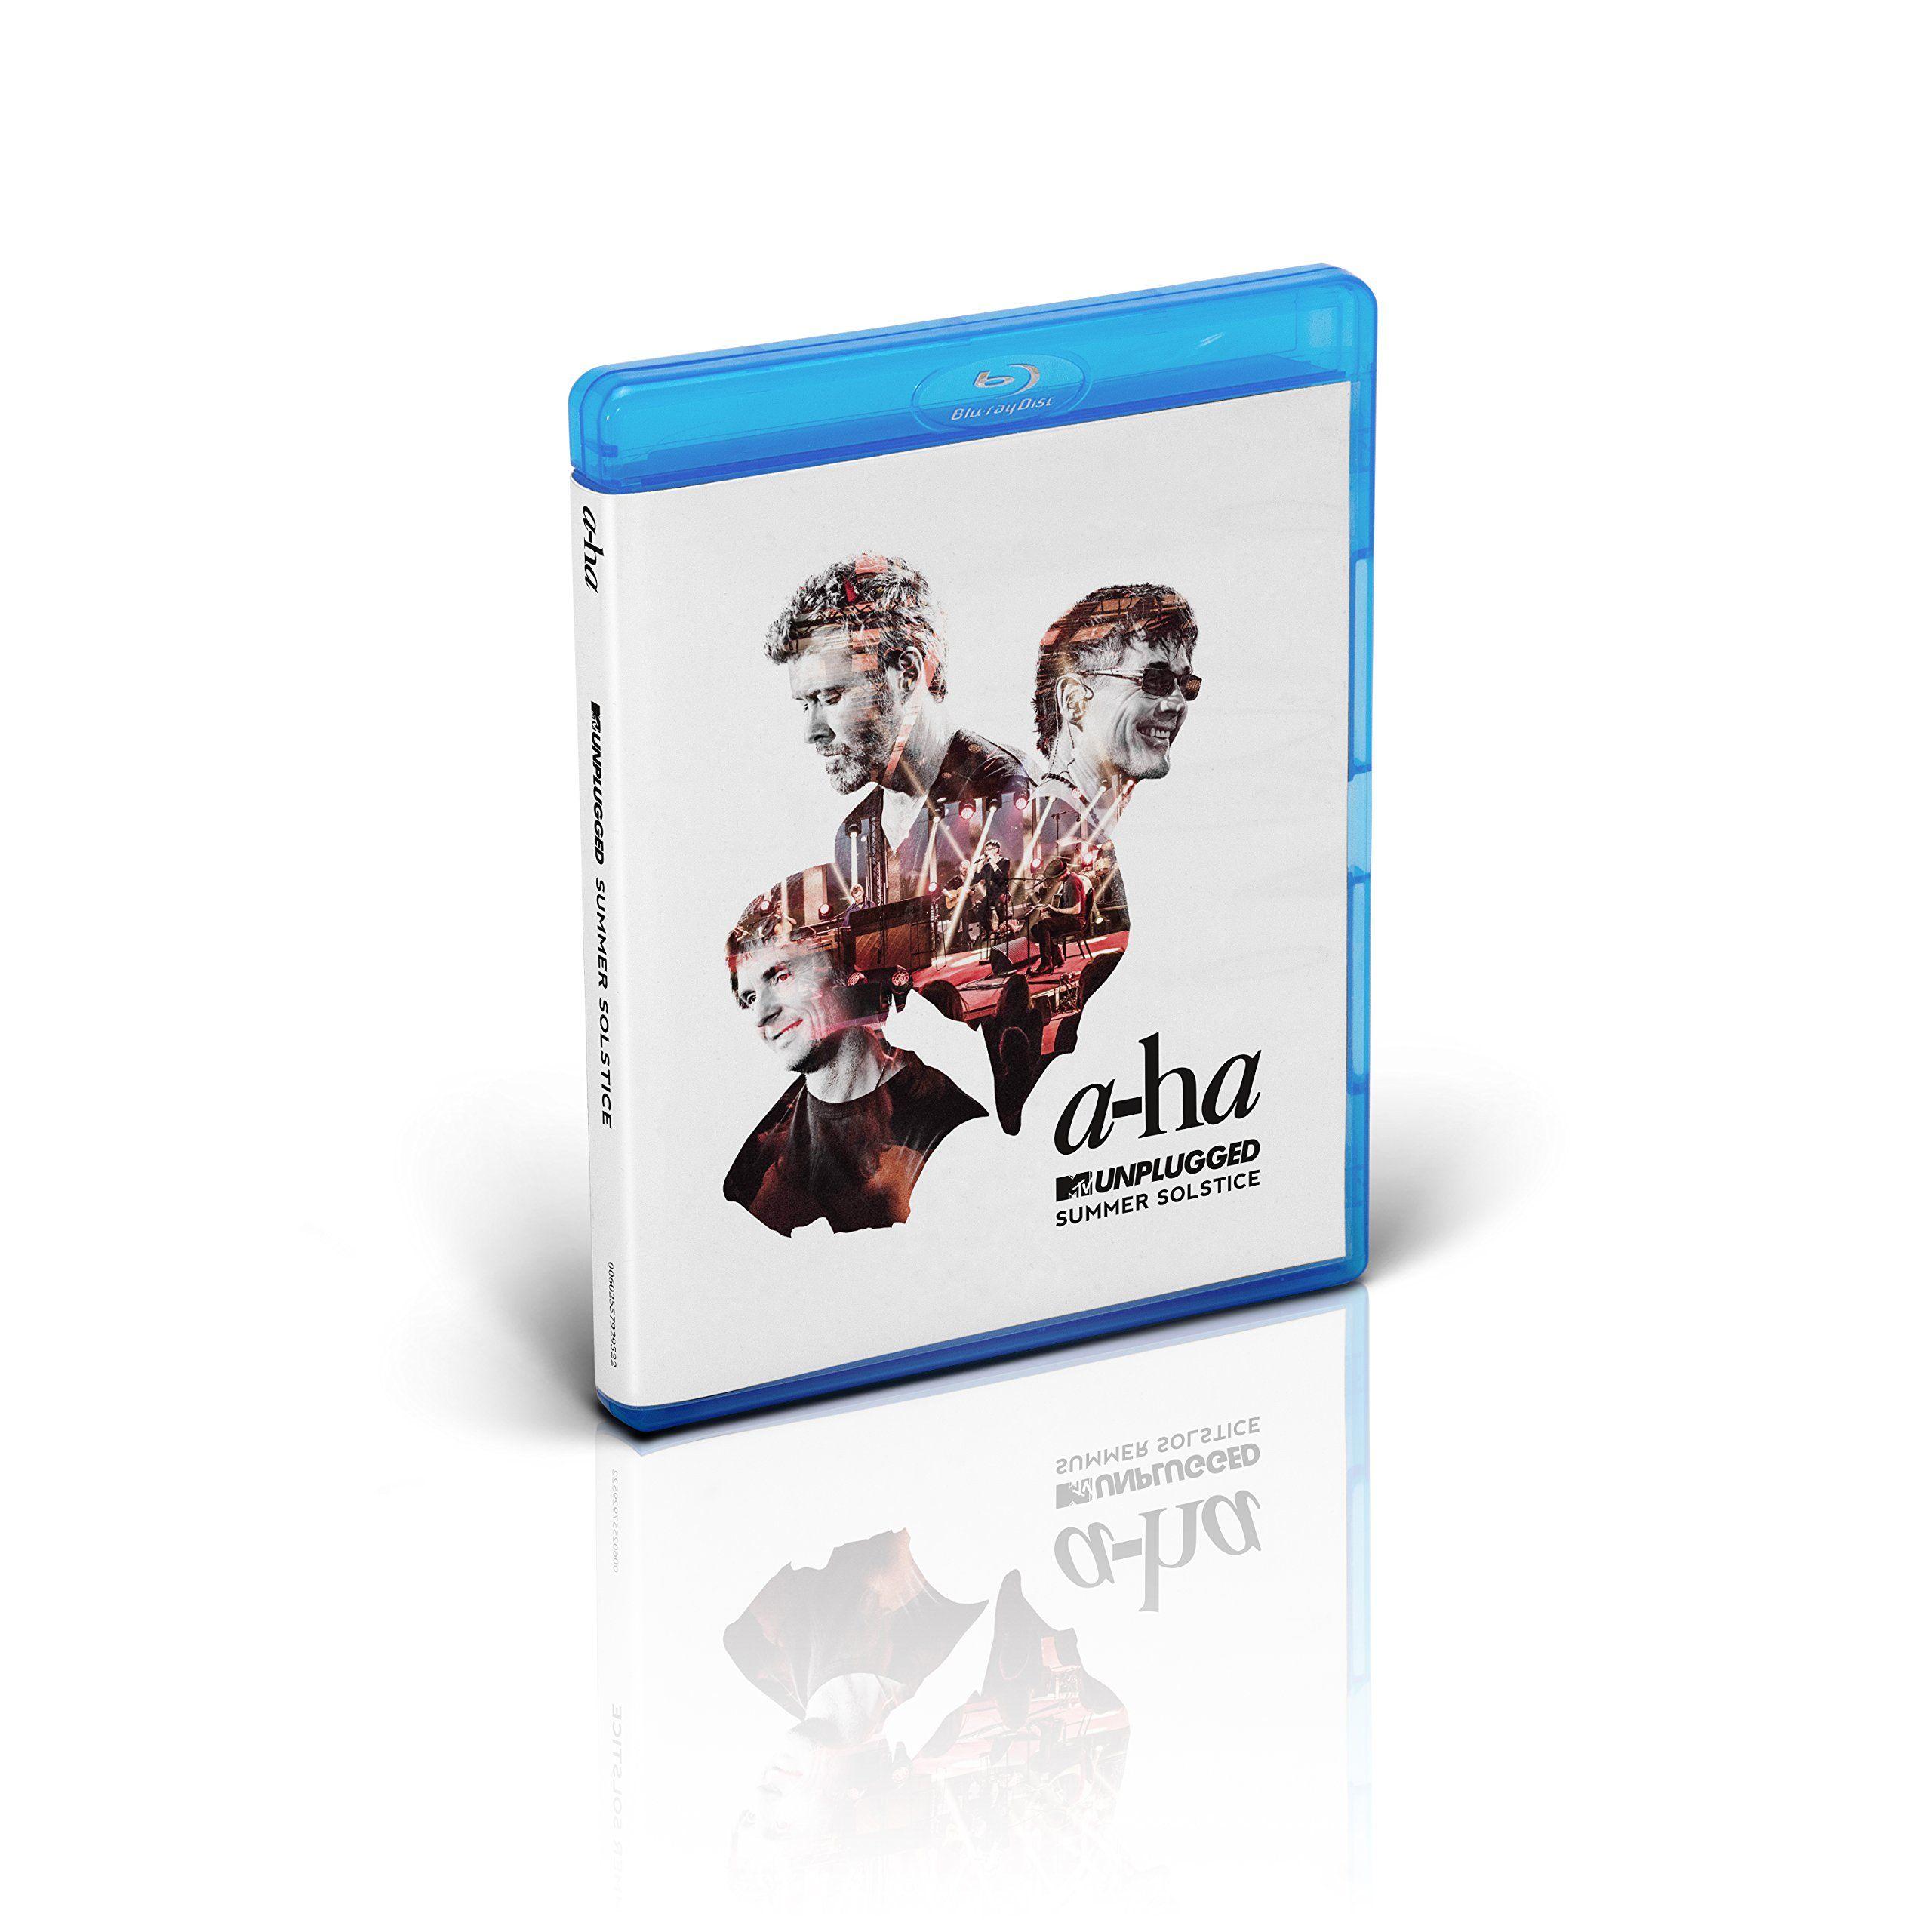 A Ha Mtv Unplugged Summer Solstice Reino Unido Blu Ray